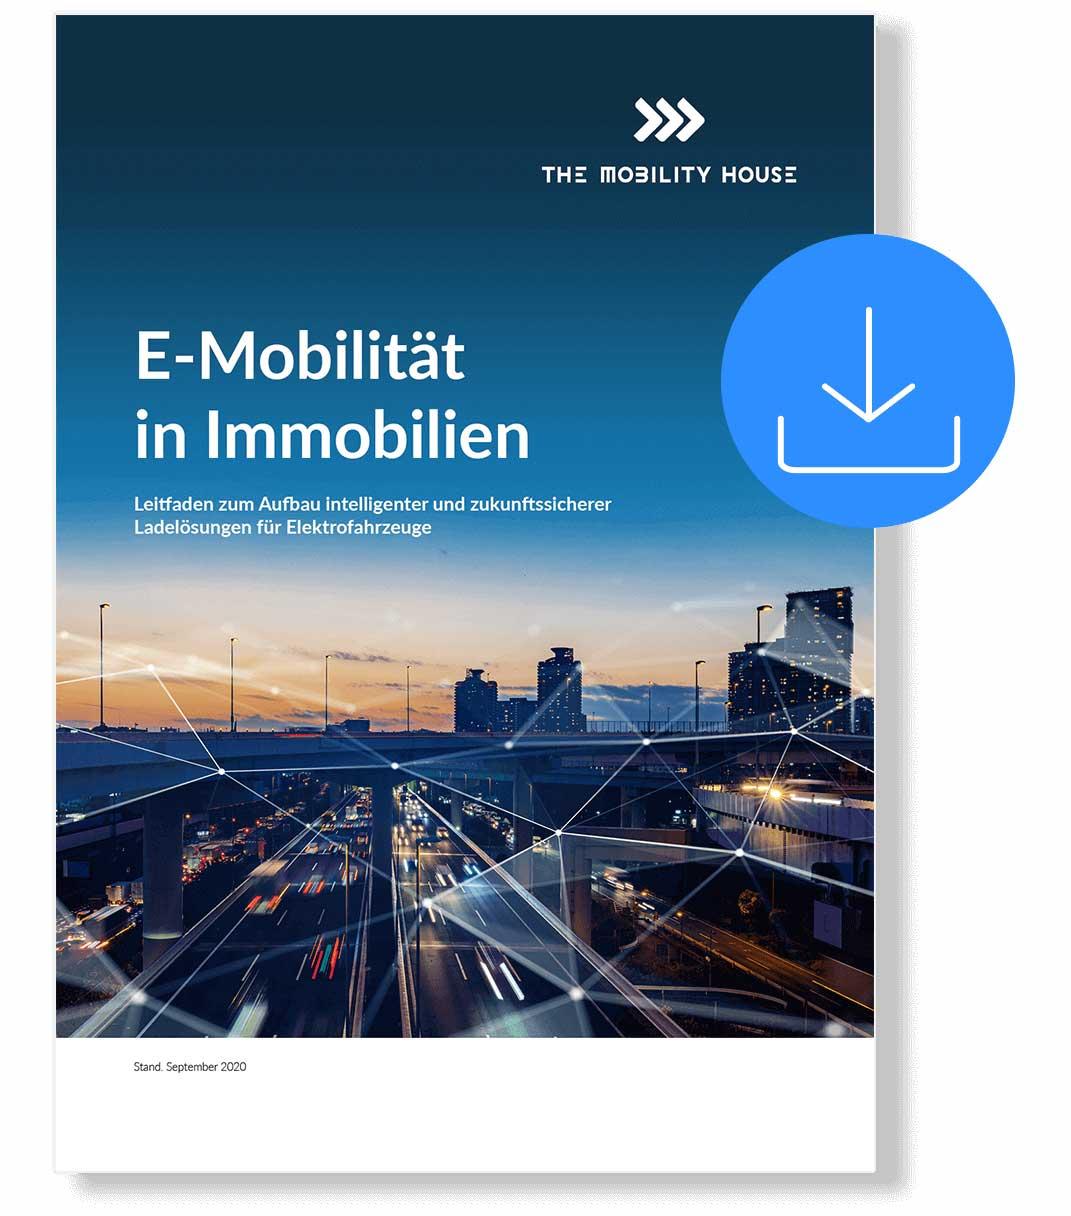 E-Mobilität in Immobilien Whitepaper